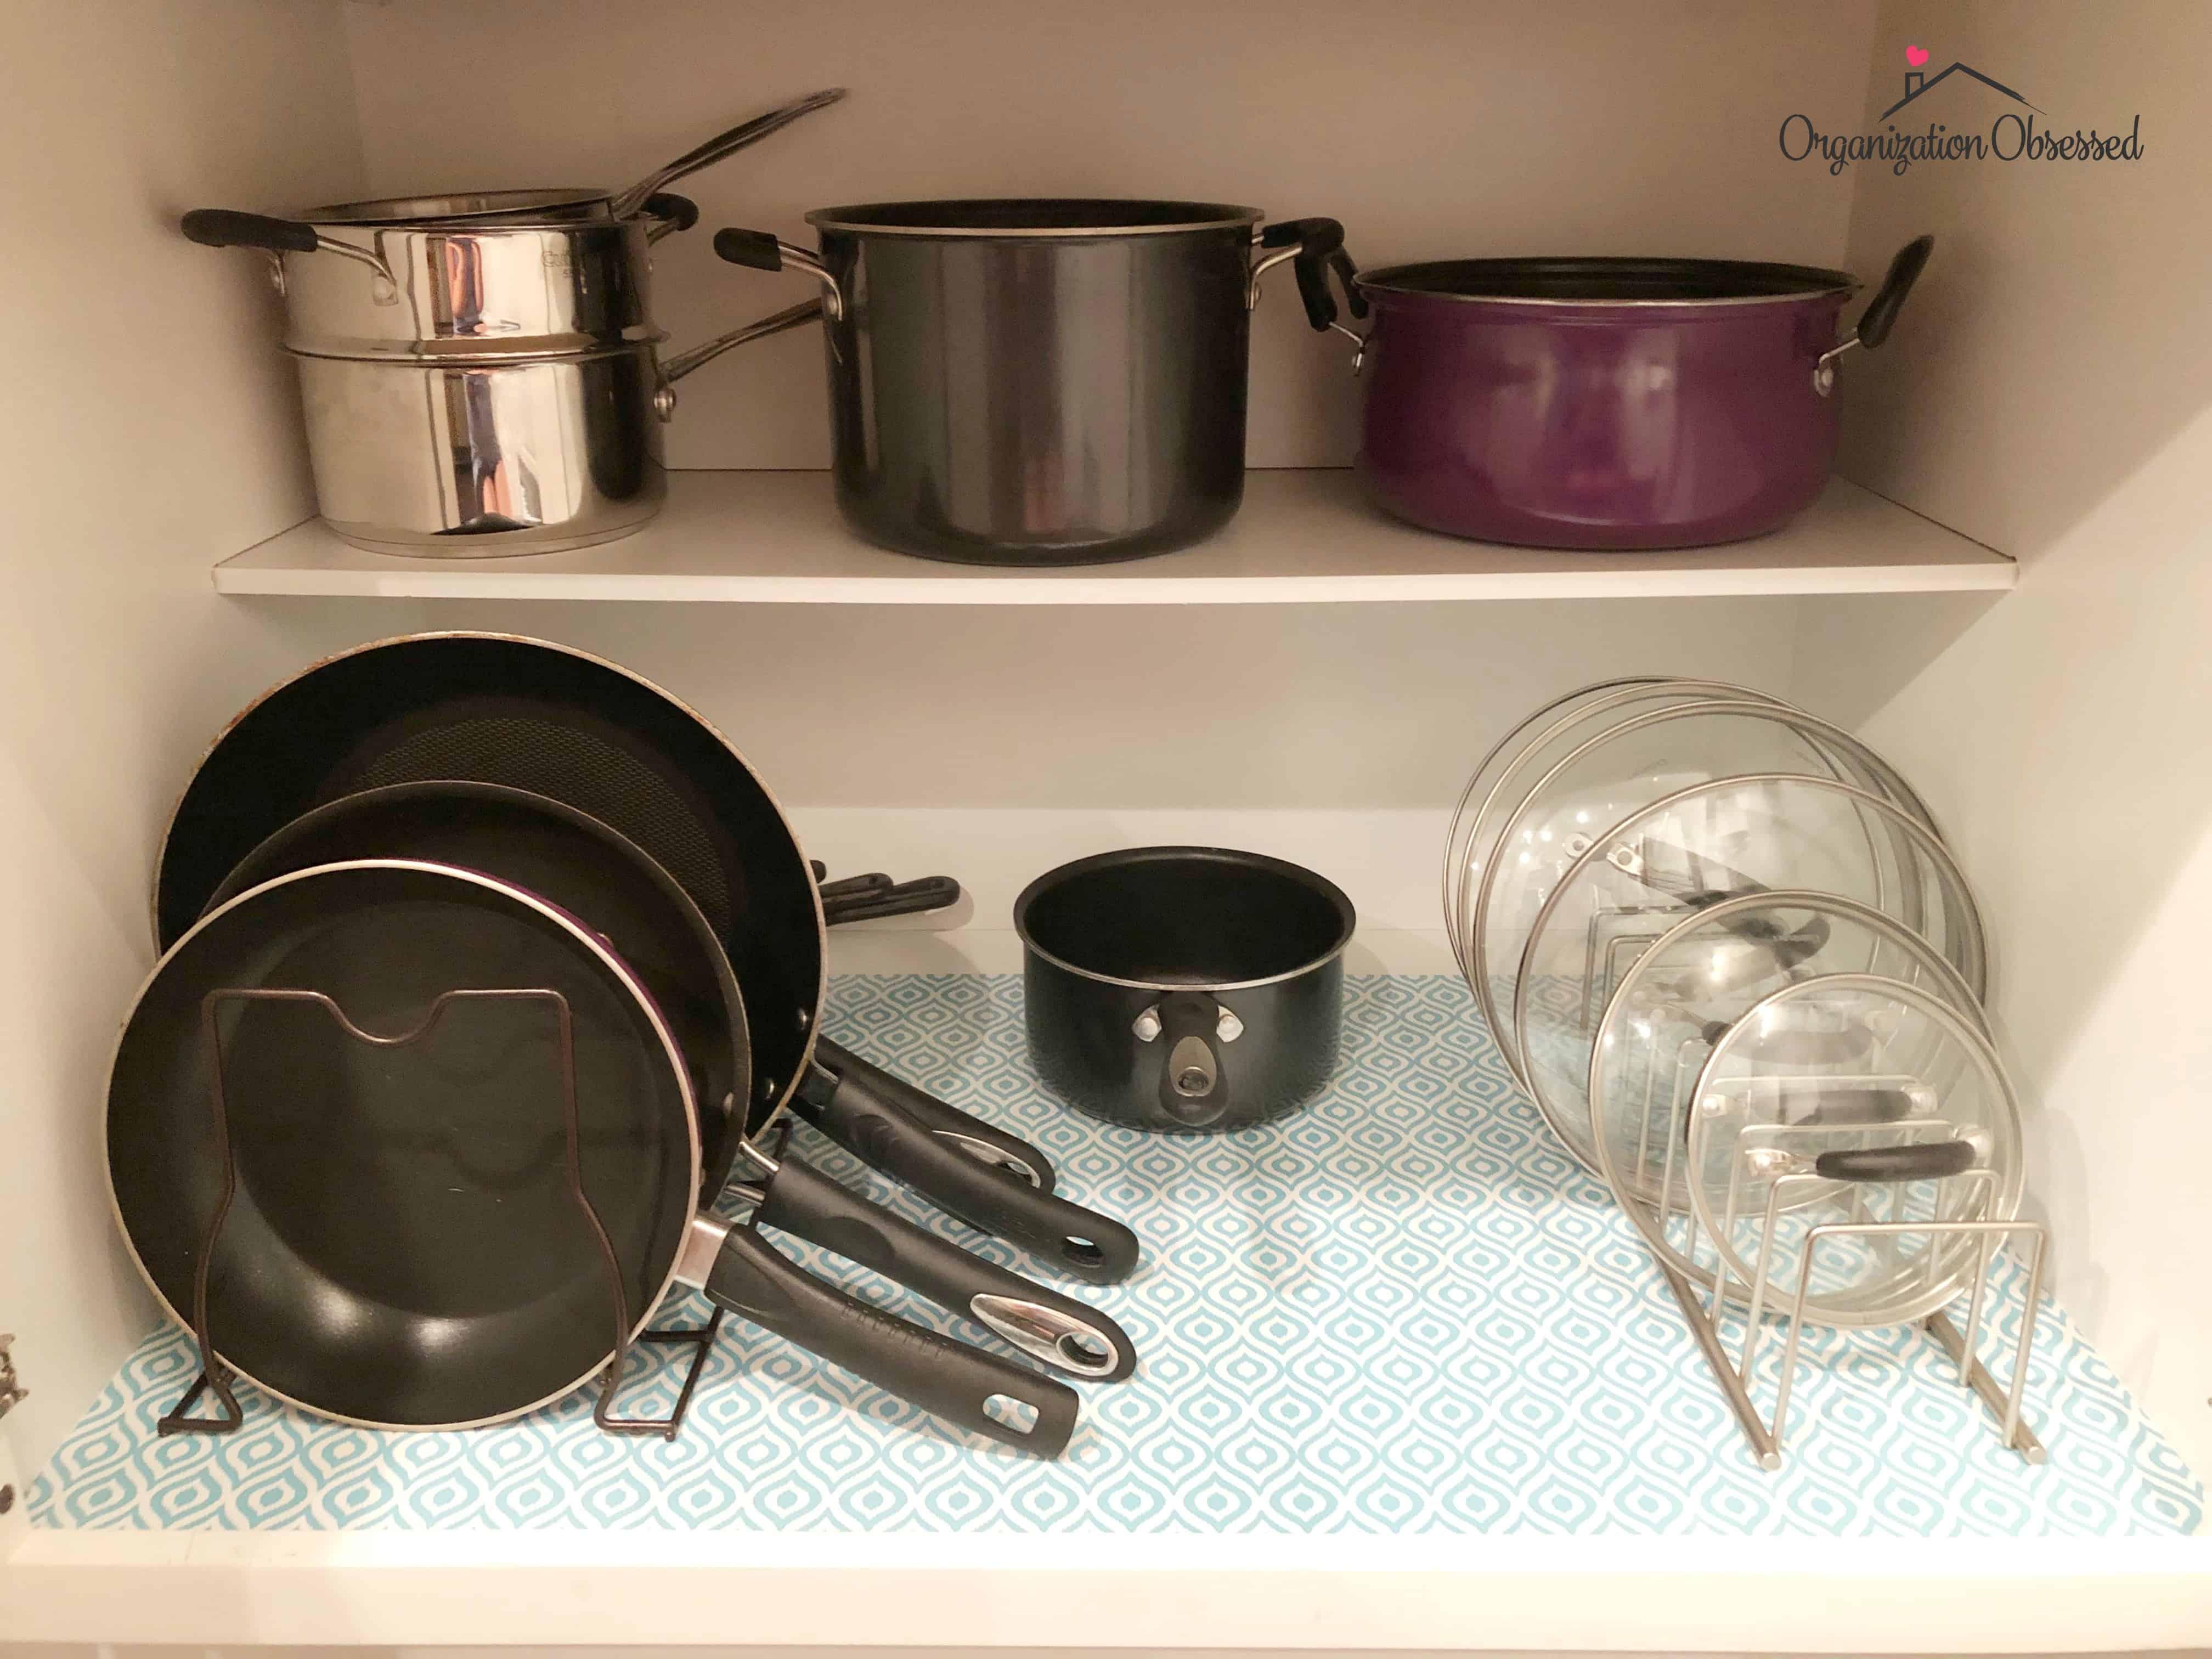 Pots & Pans Kitchen Organizer for less than $20